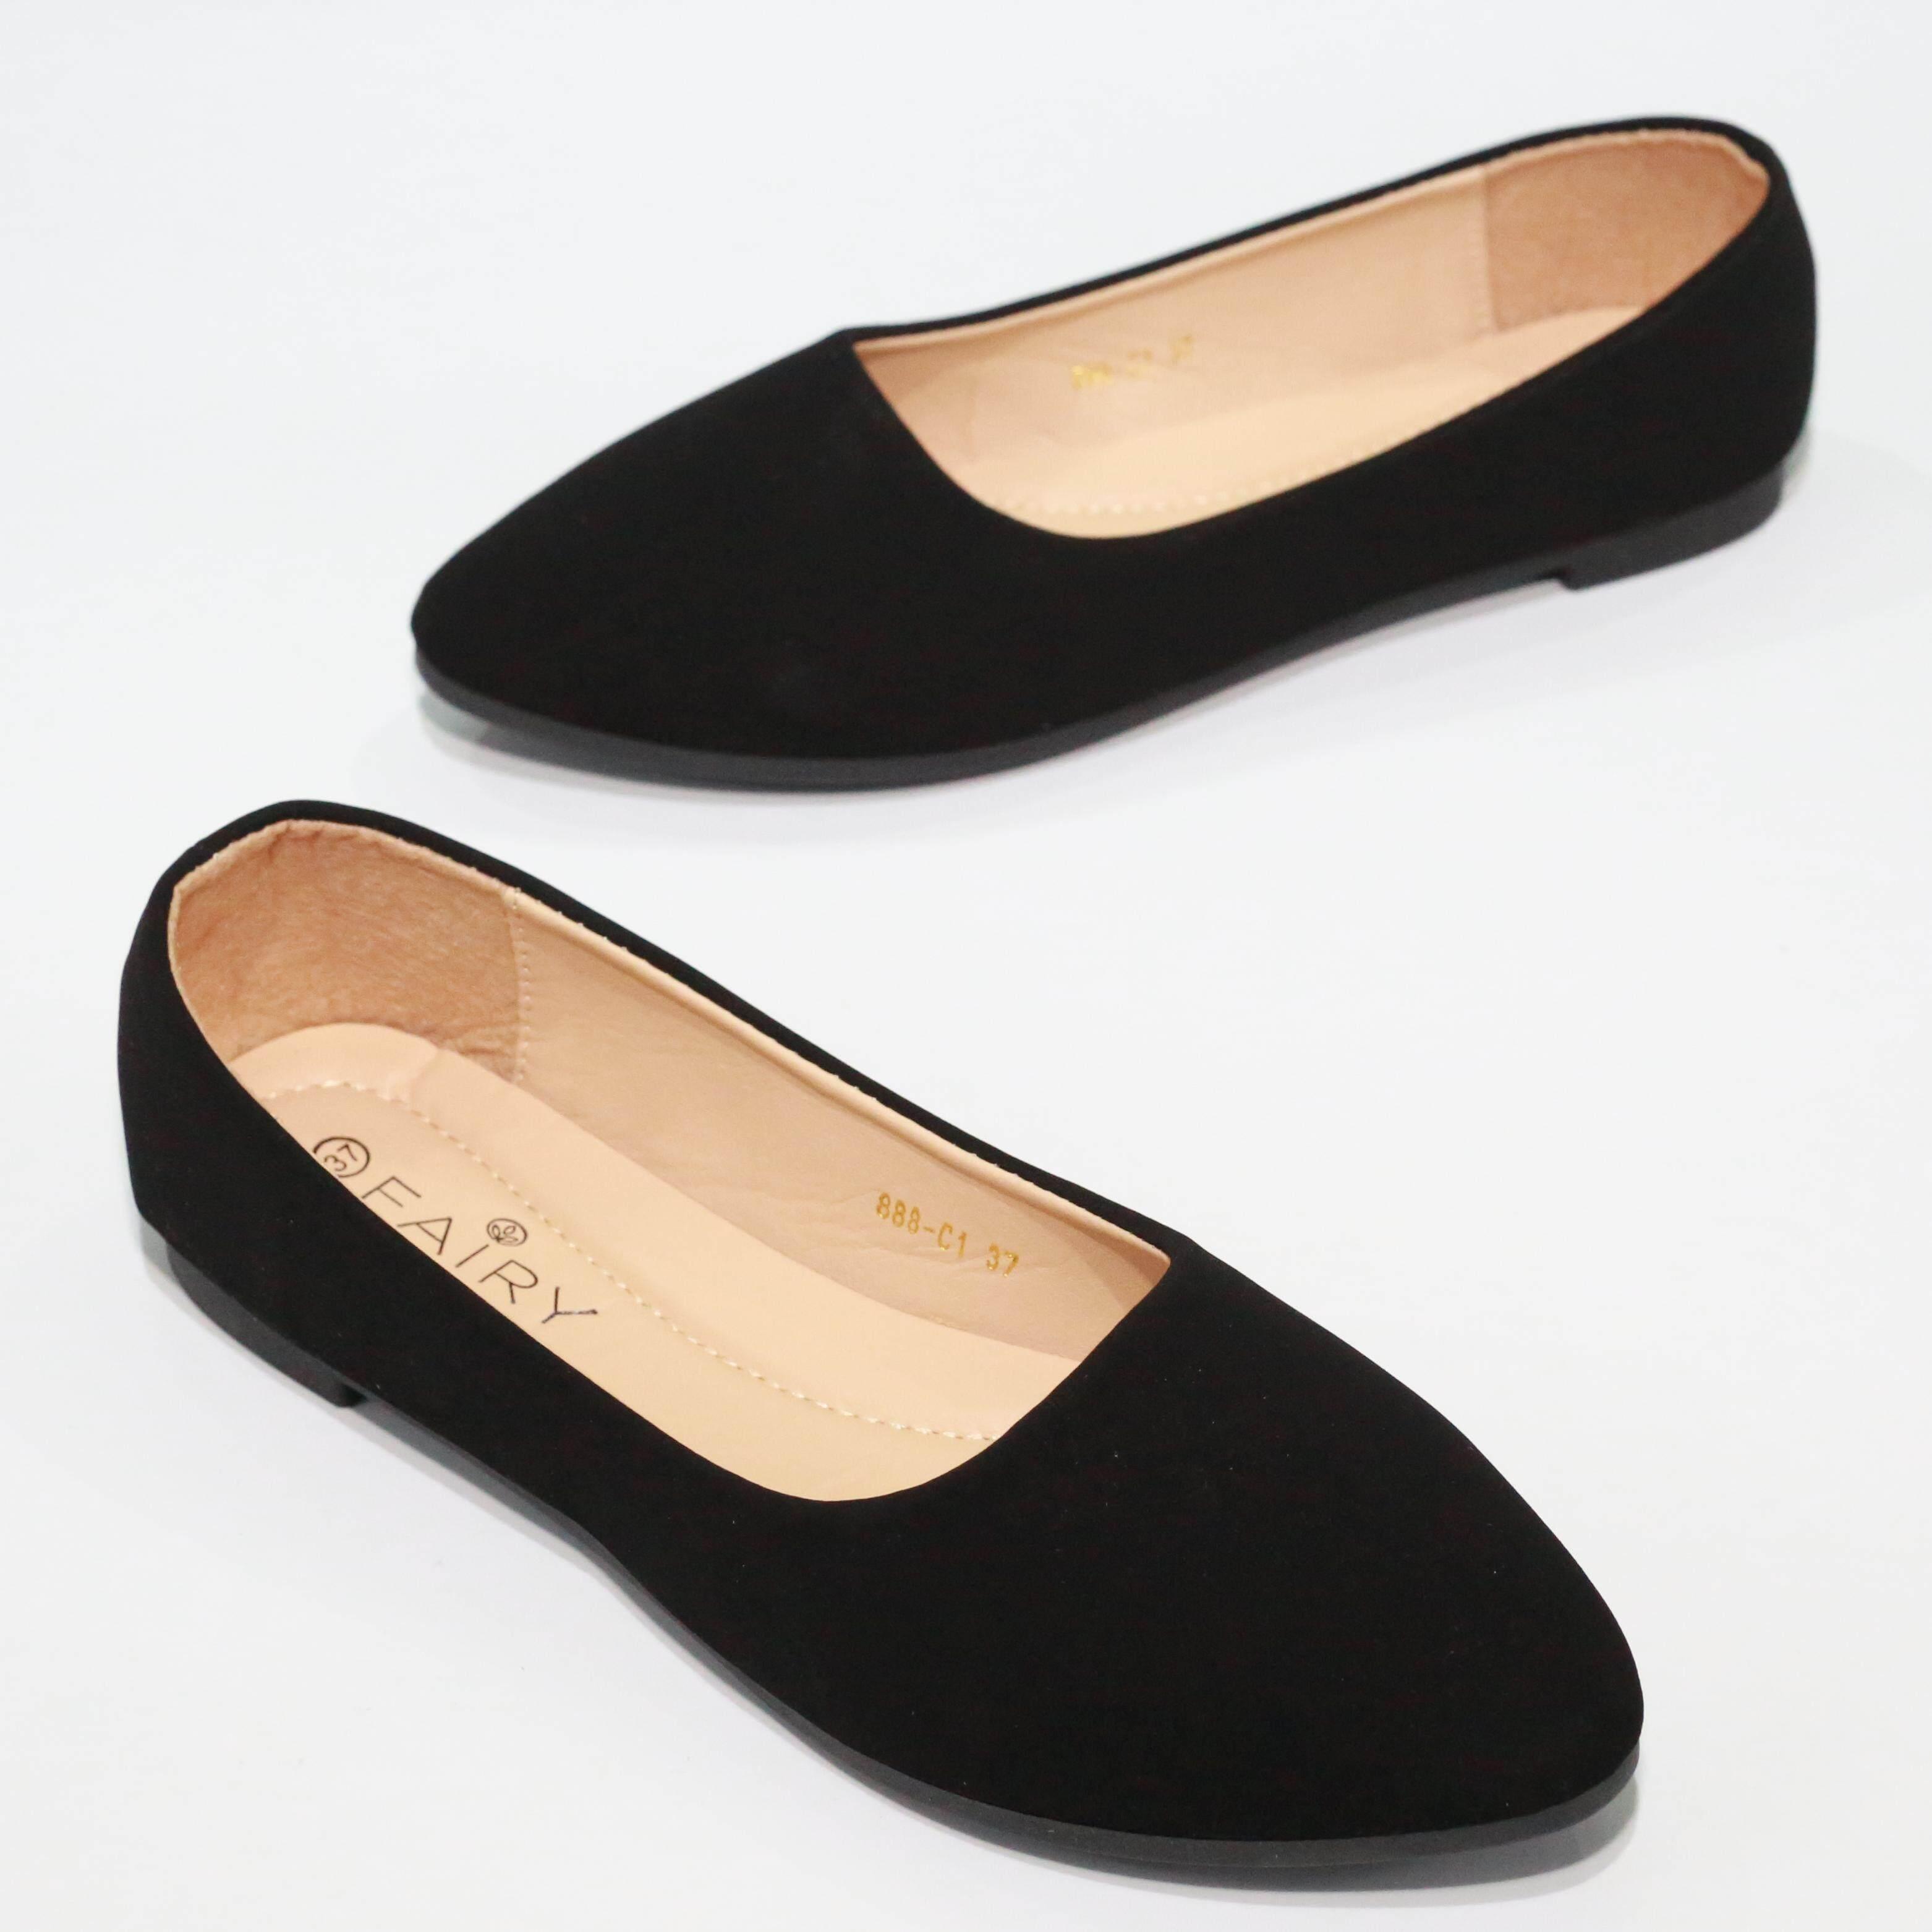 888-C1 รองเท้าส้นแบน หนังนูบัด